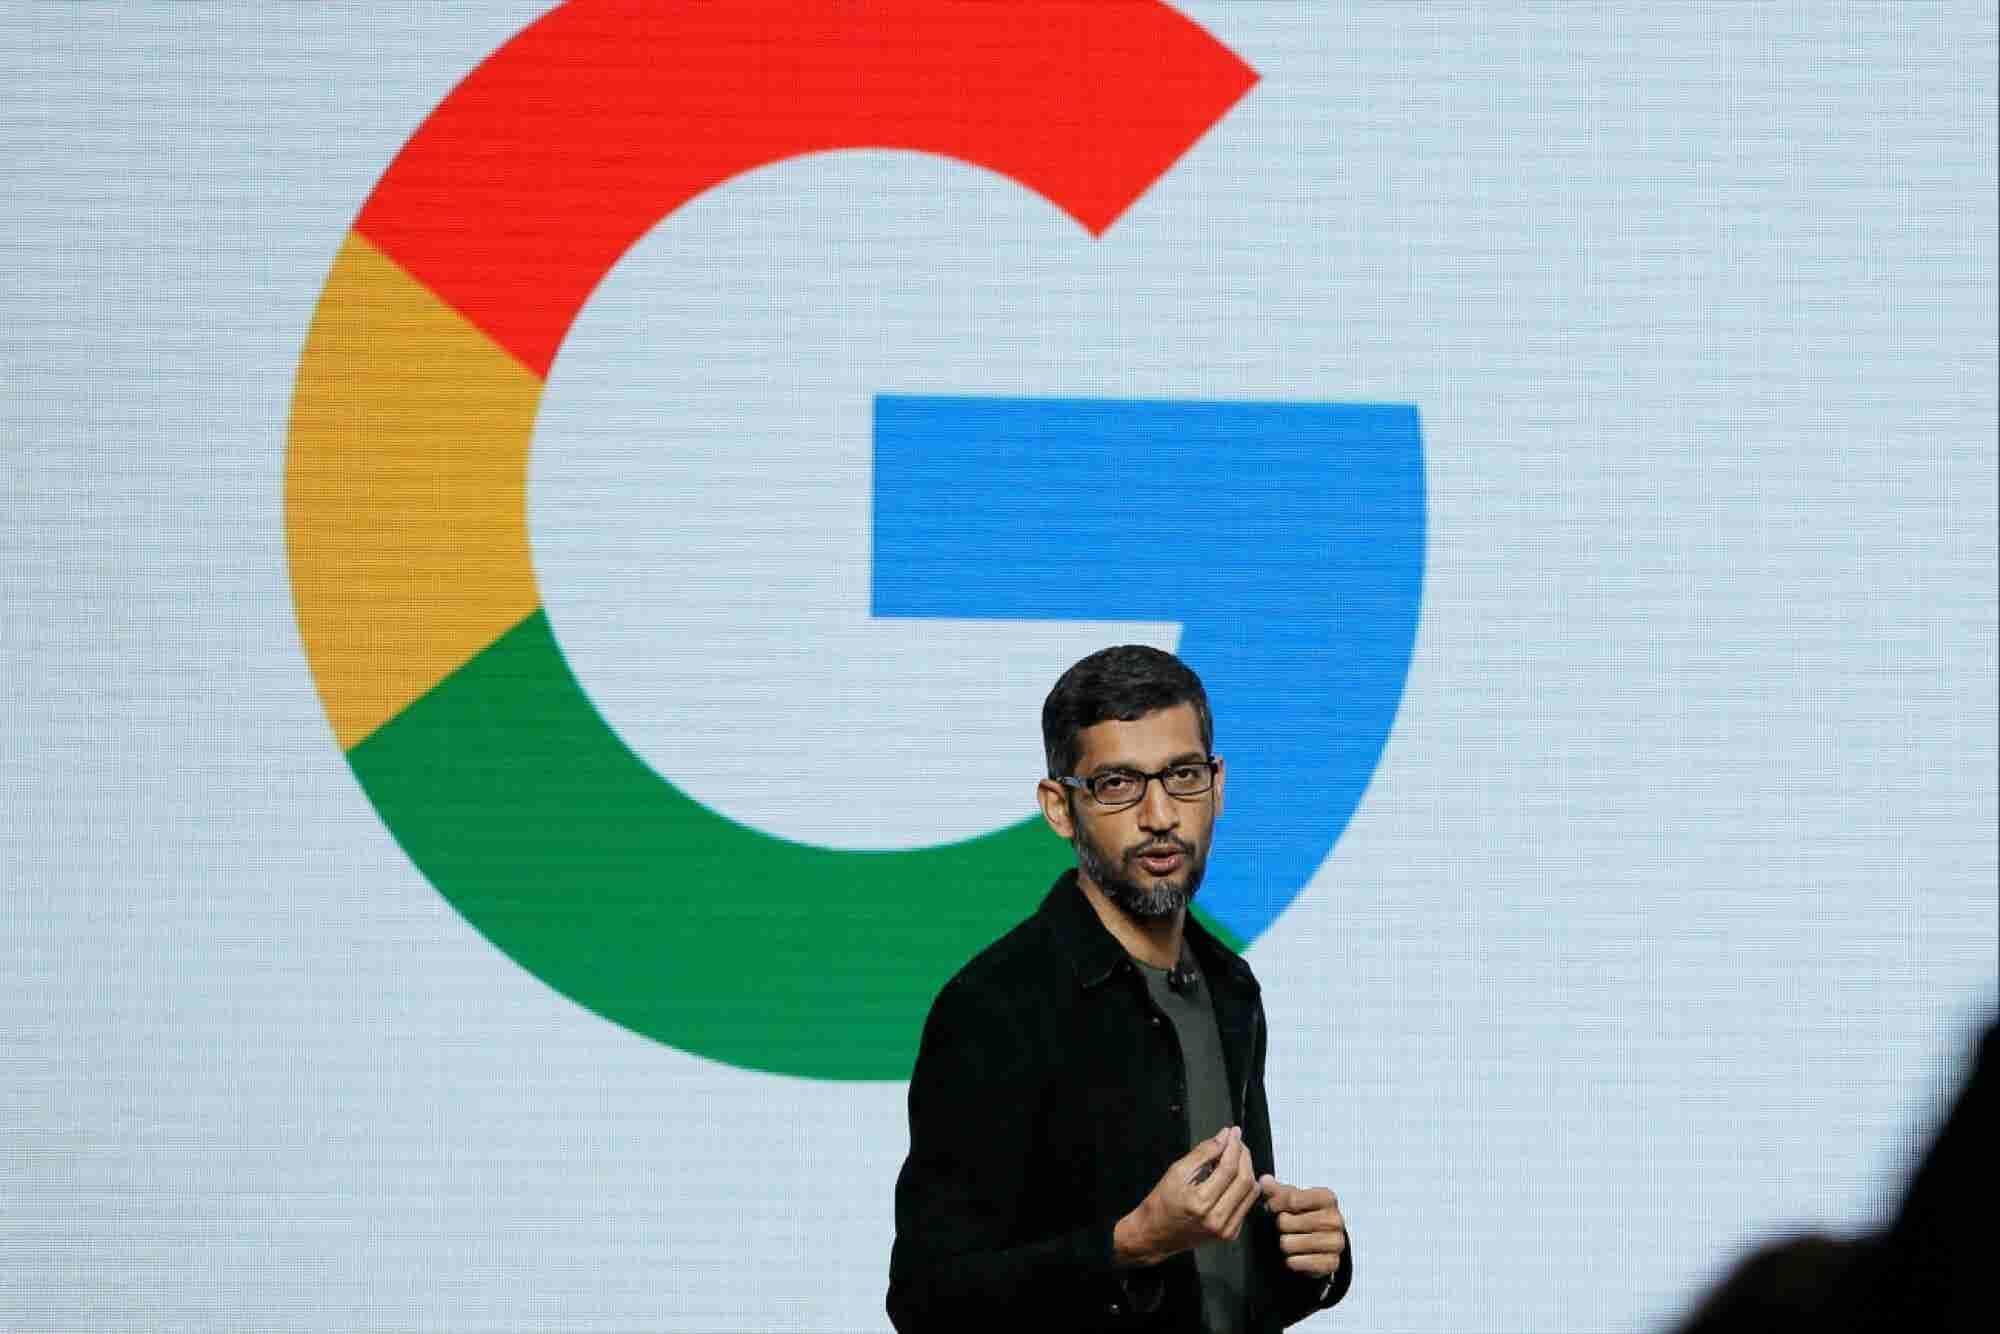 Analysts Predict the YouTube Advertiser Boycott Will Cost Google $750 Million